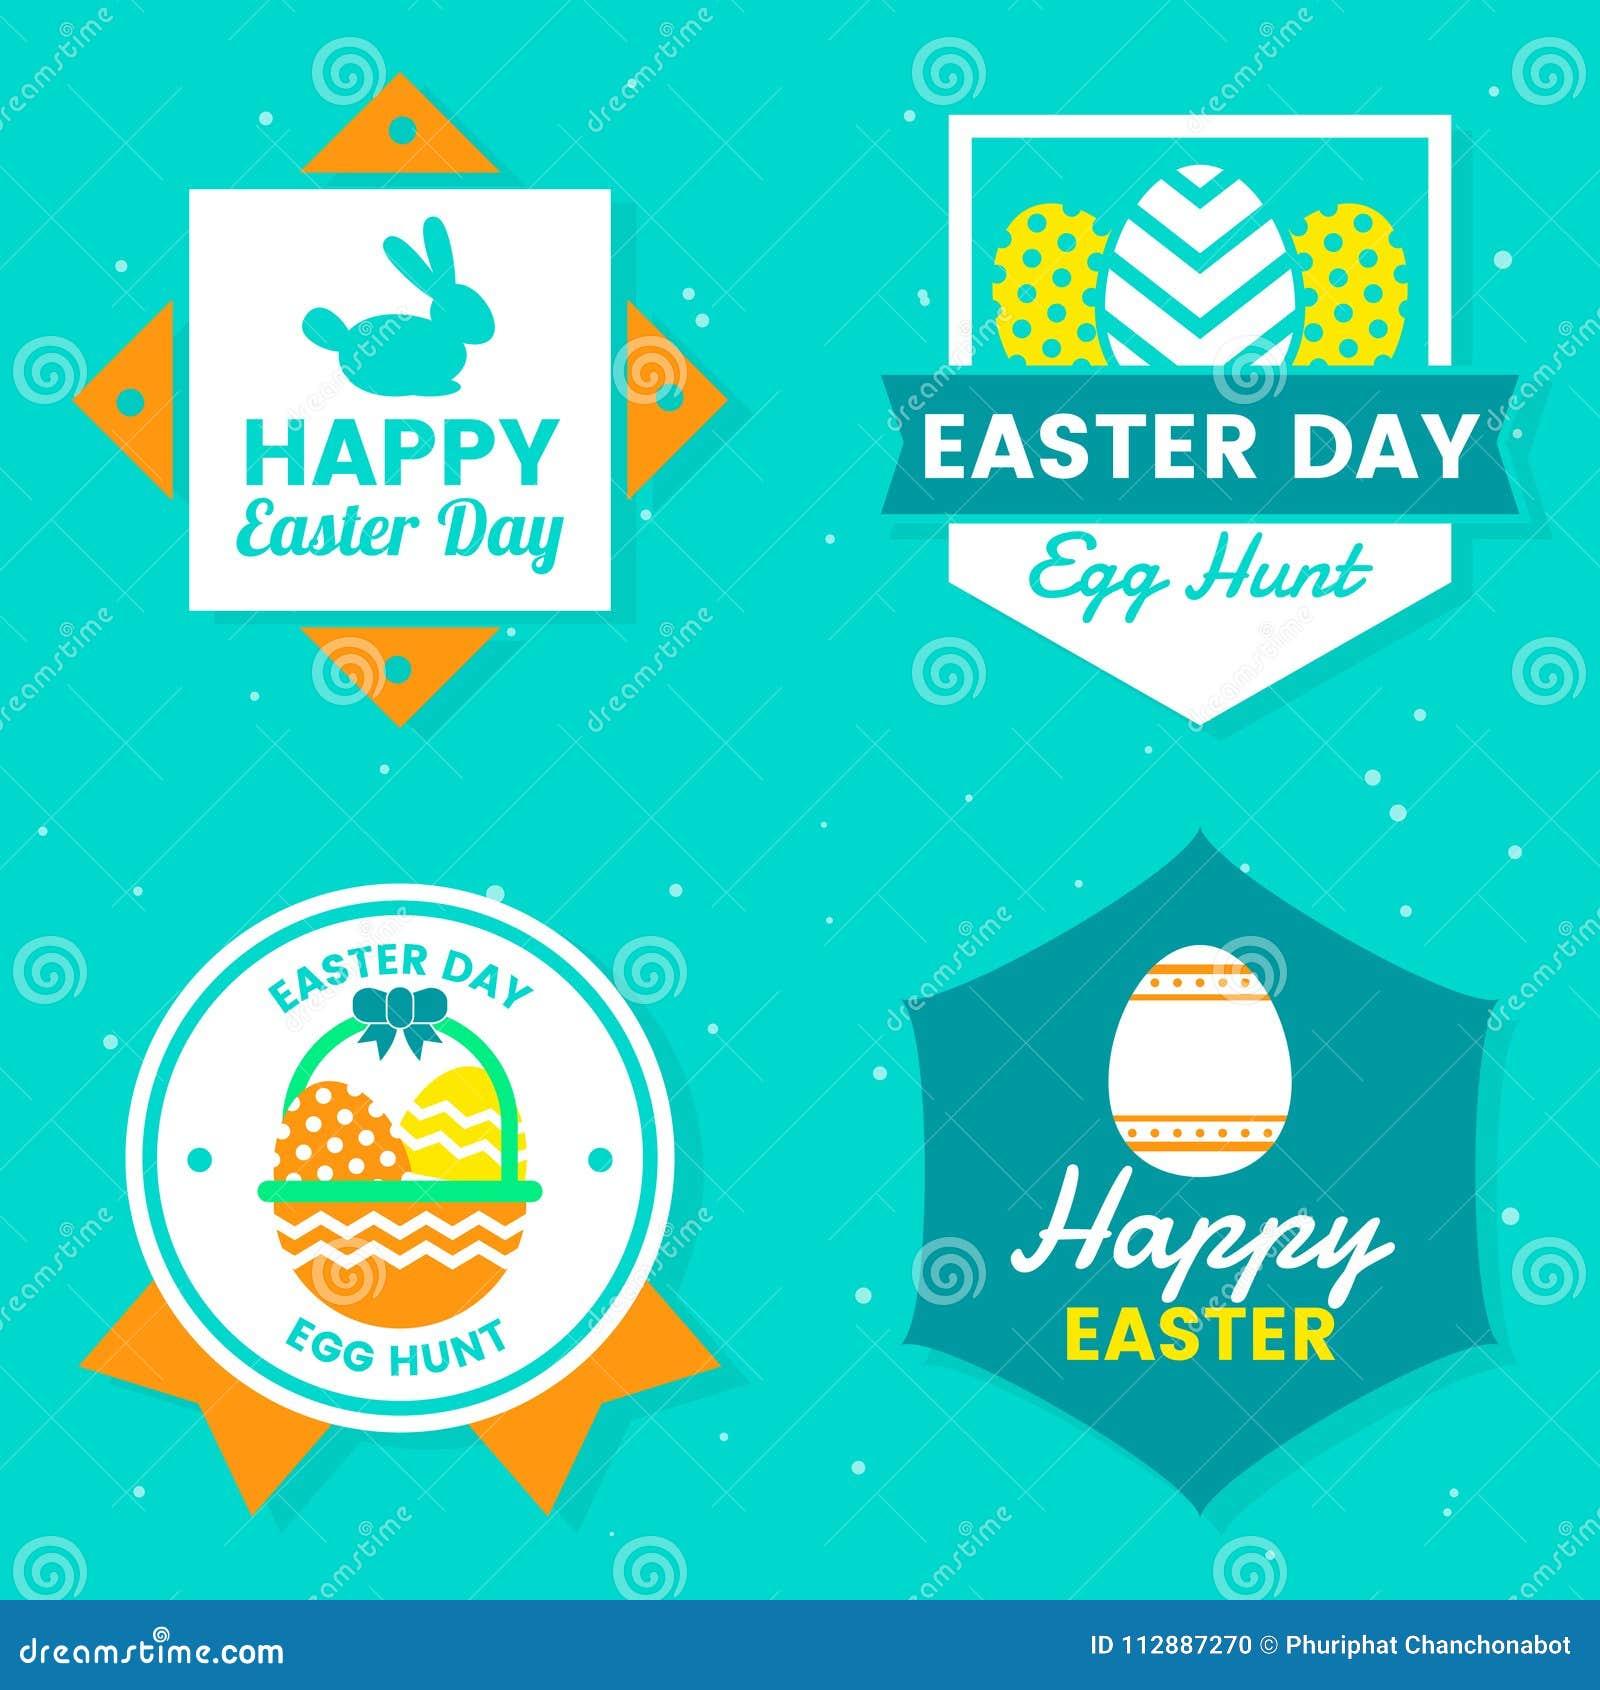 Easter Day Vector Logo For Banner Stock Vector Illustration Of